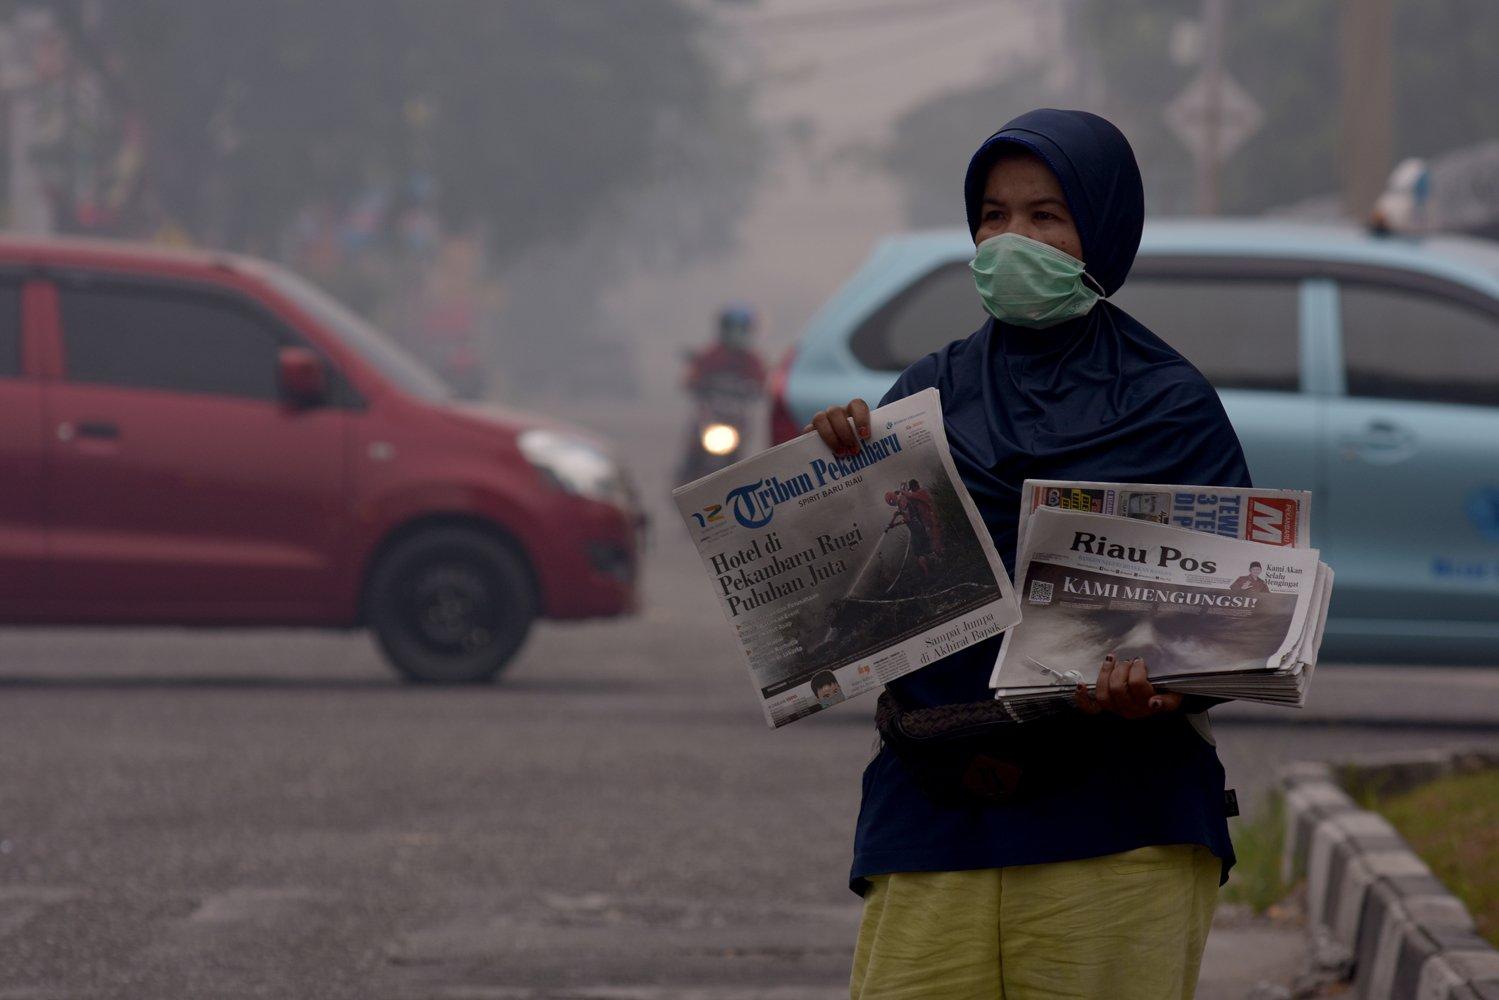 Seorang penjual koran mengenakan masker medis saat berjualan di tengah asap kebakaran hutan dan lahan (Karhutla) yang makin pekat menyelimuti Kota Pekanbaru, Riau, Jumat (13/9/2019). Pusat Pengendalian Pembangunan Ekoregion (P3E) Sumatera hasil pengukuran Indeks Standar Pencemar Udara (ISPU) menunjukan sebagian besar daerah di Riau dalam kualitas udara dalam kategori berbahaya karena tercemar asap Karhutla.